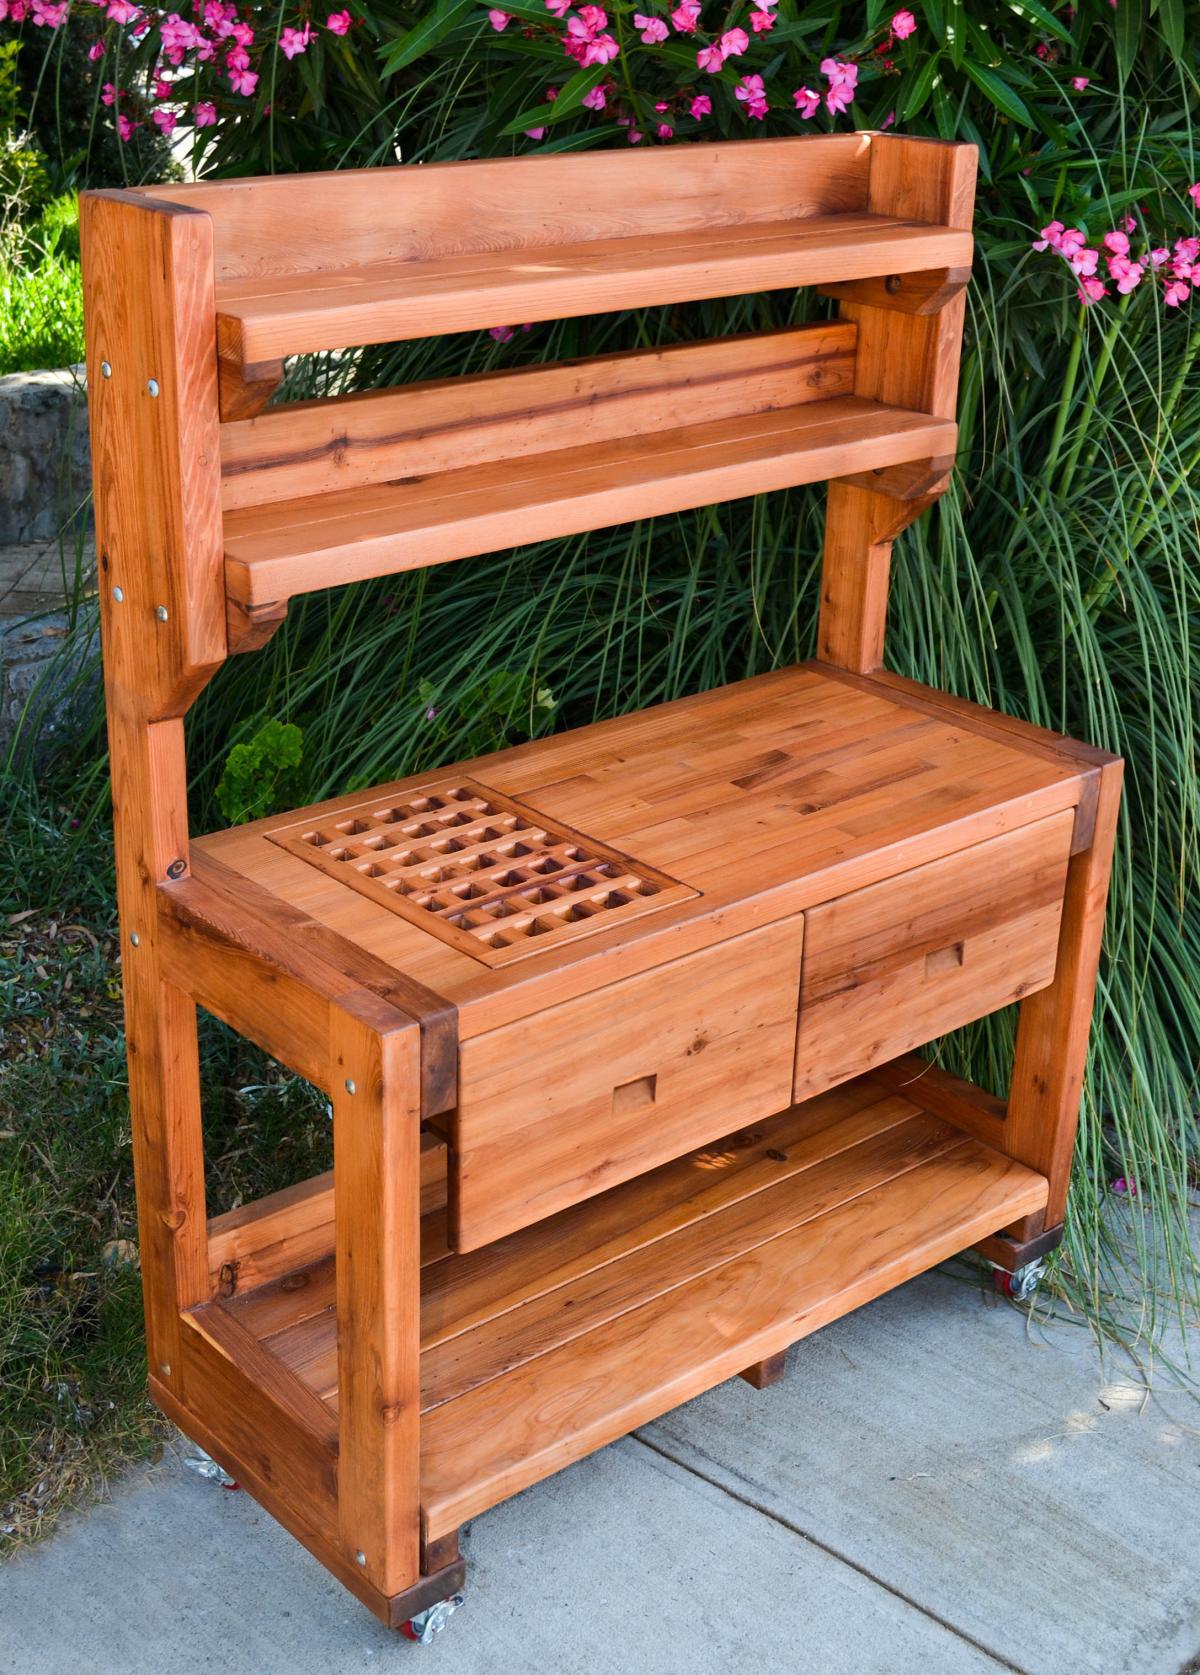 Redwood Patio Furniture Home Depot: Redwood Potting Bench, Custom Outdoor Wood Bench